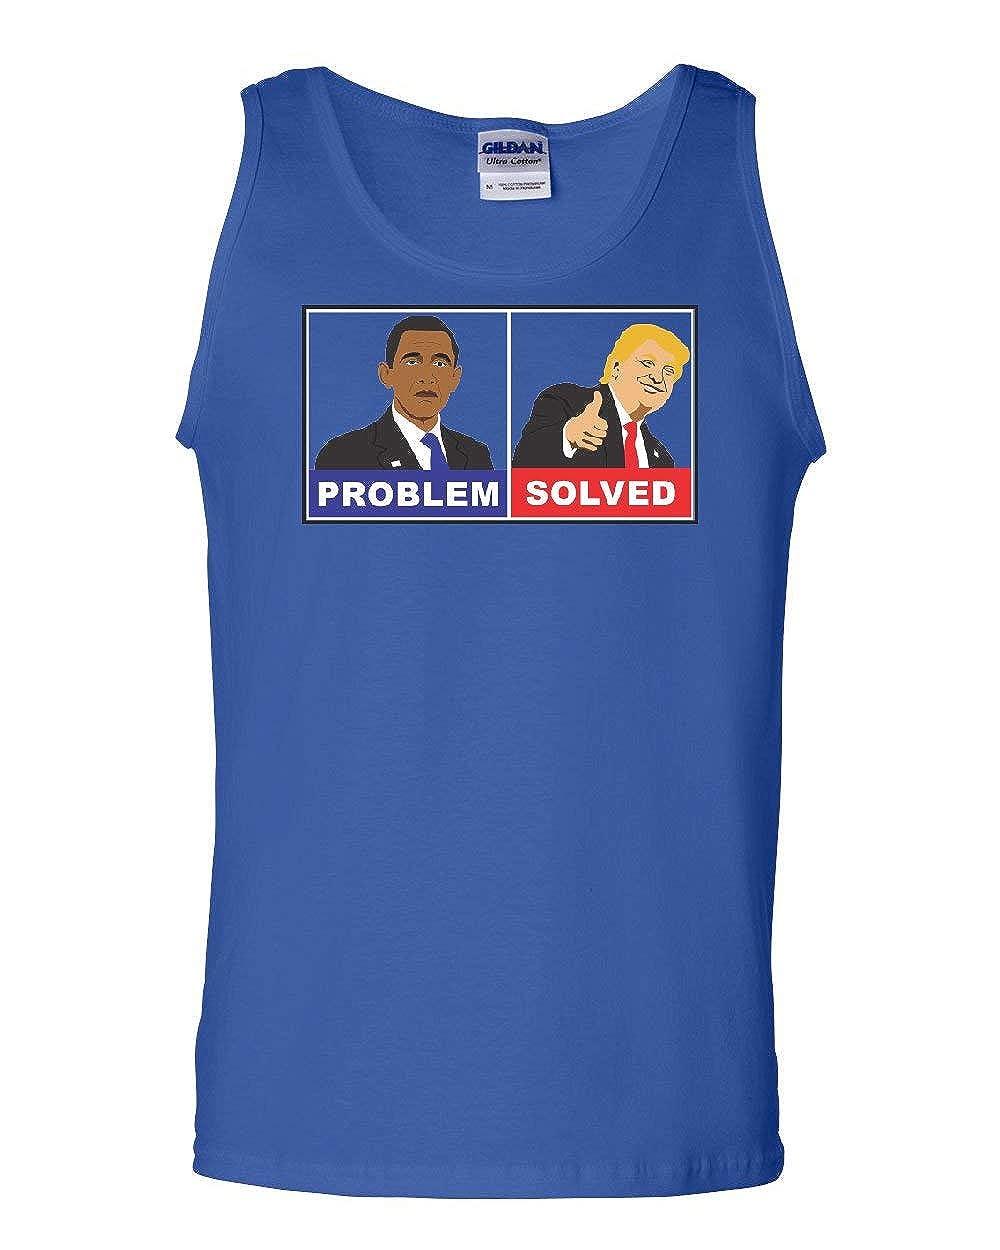 Tee Hunt Trump Obama Problem Solved Tank Top Pro Trump MAGA President 2020 Sleeveless